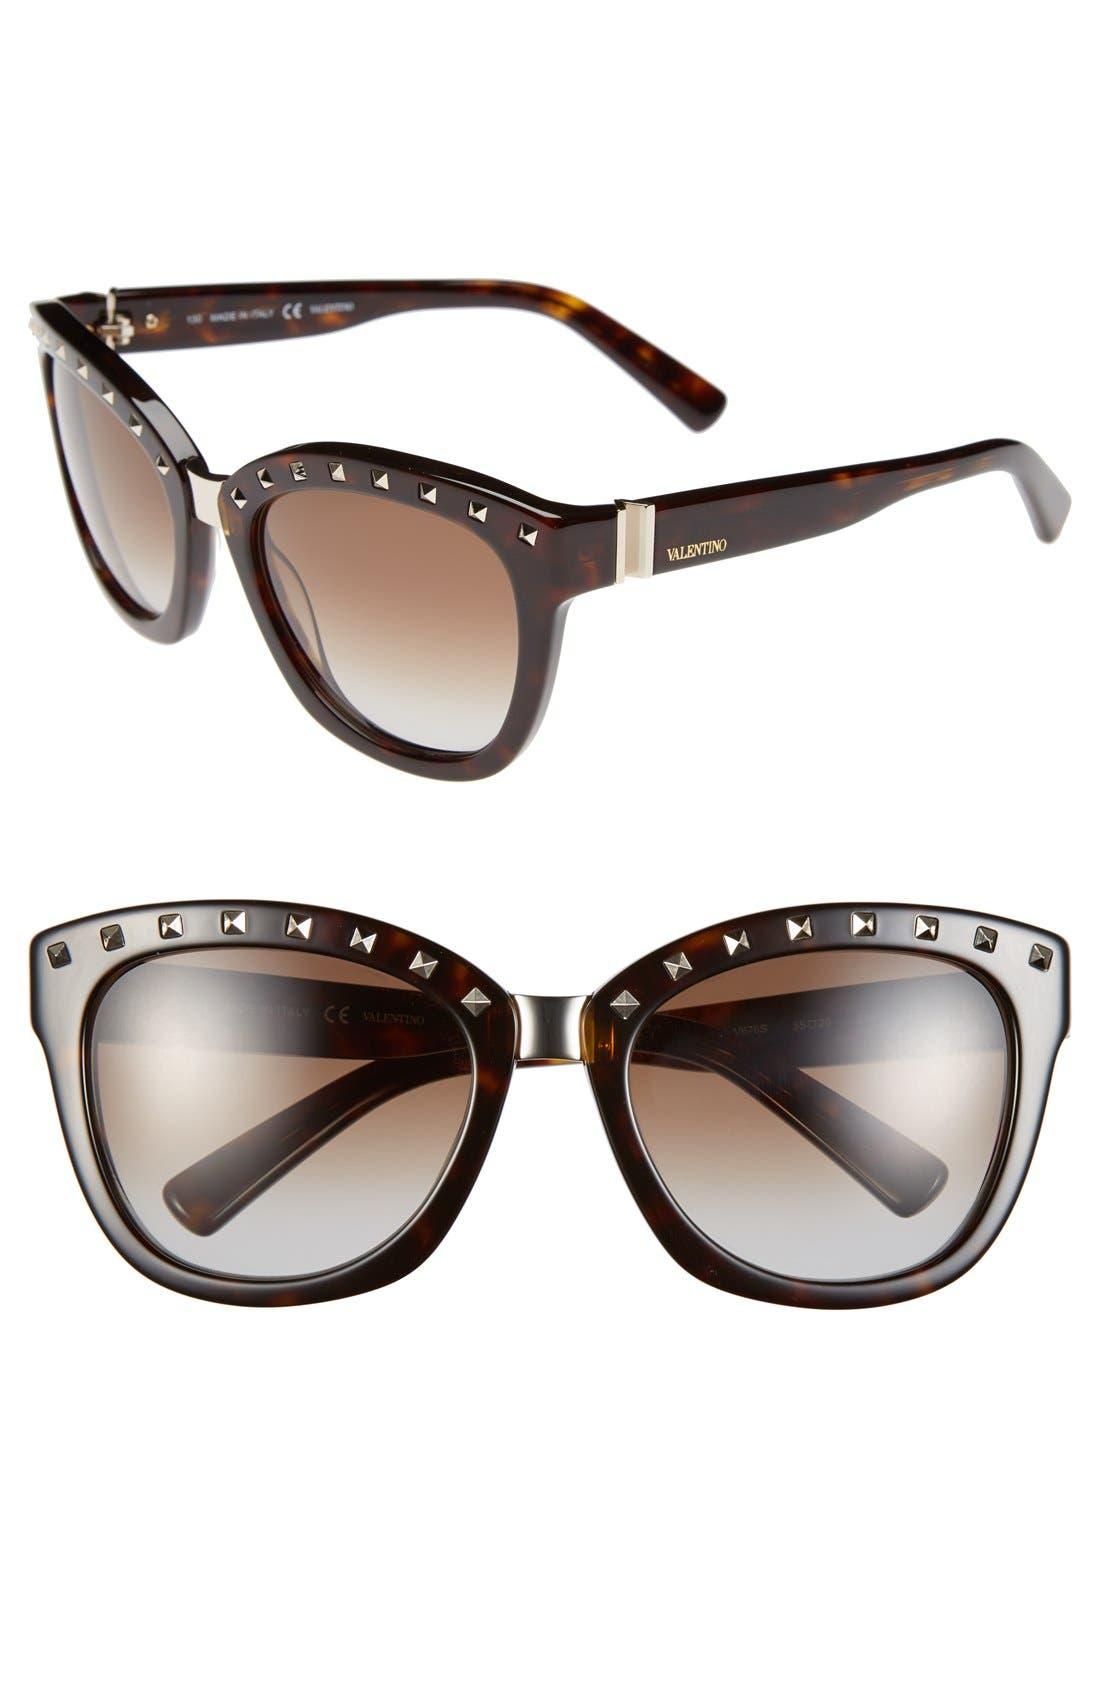 Main Image - Valentino 'Rockstud' 55mm Studded Sunglasses